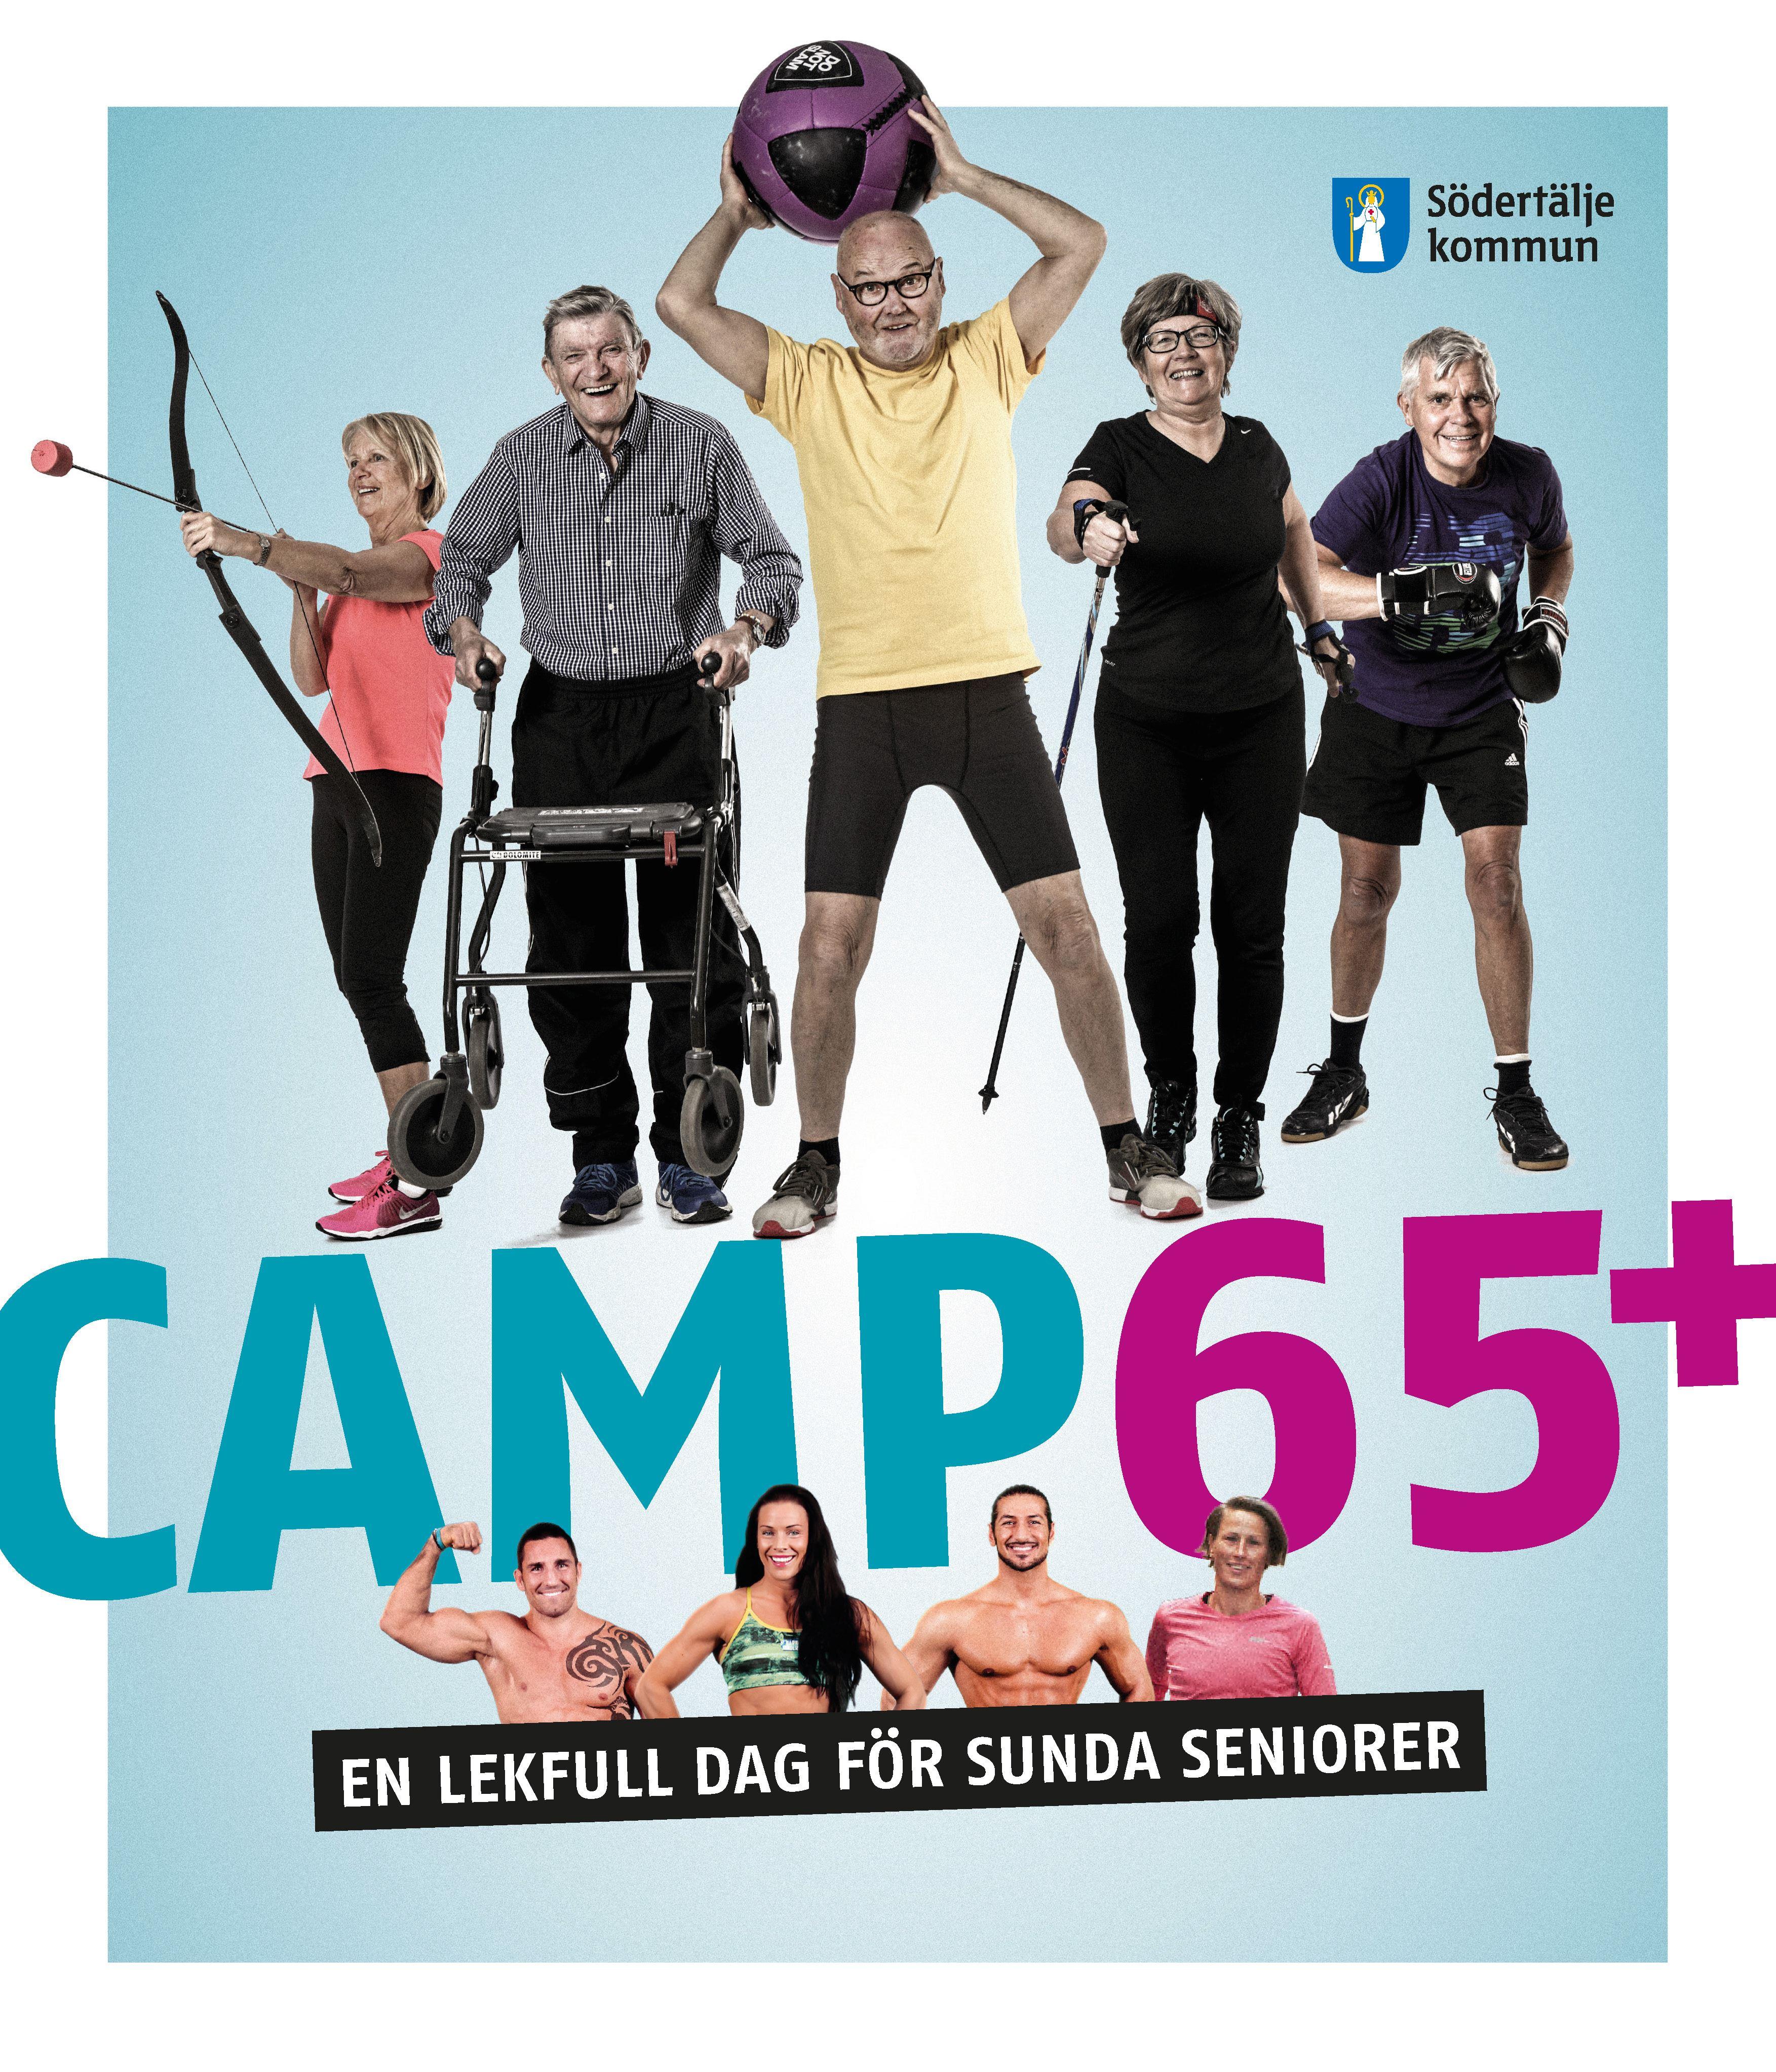 CAMP 65+